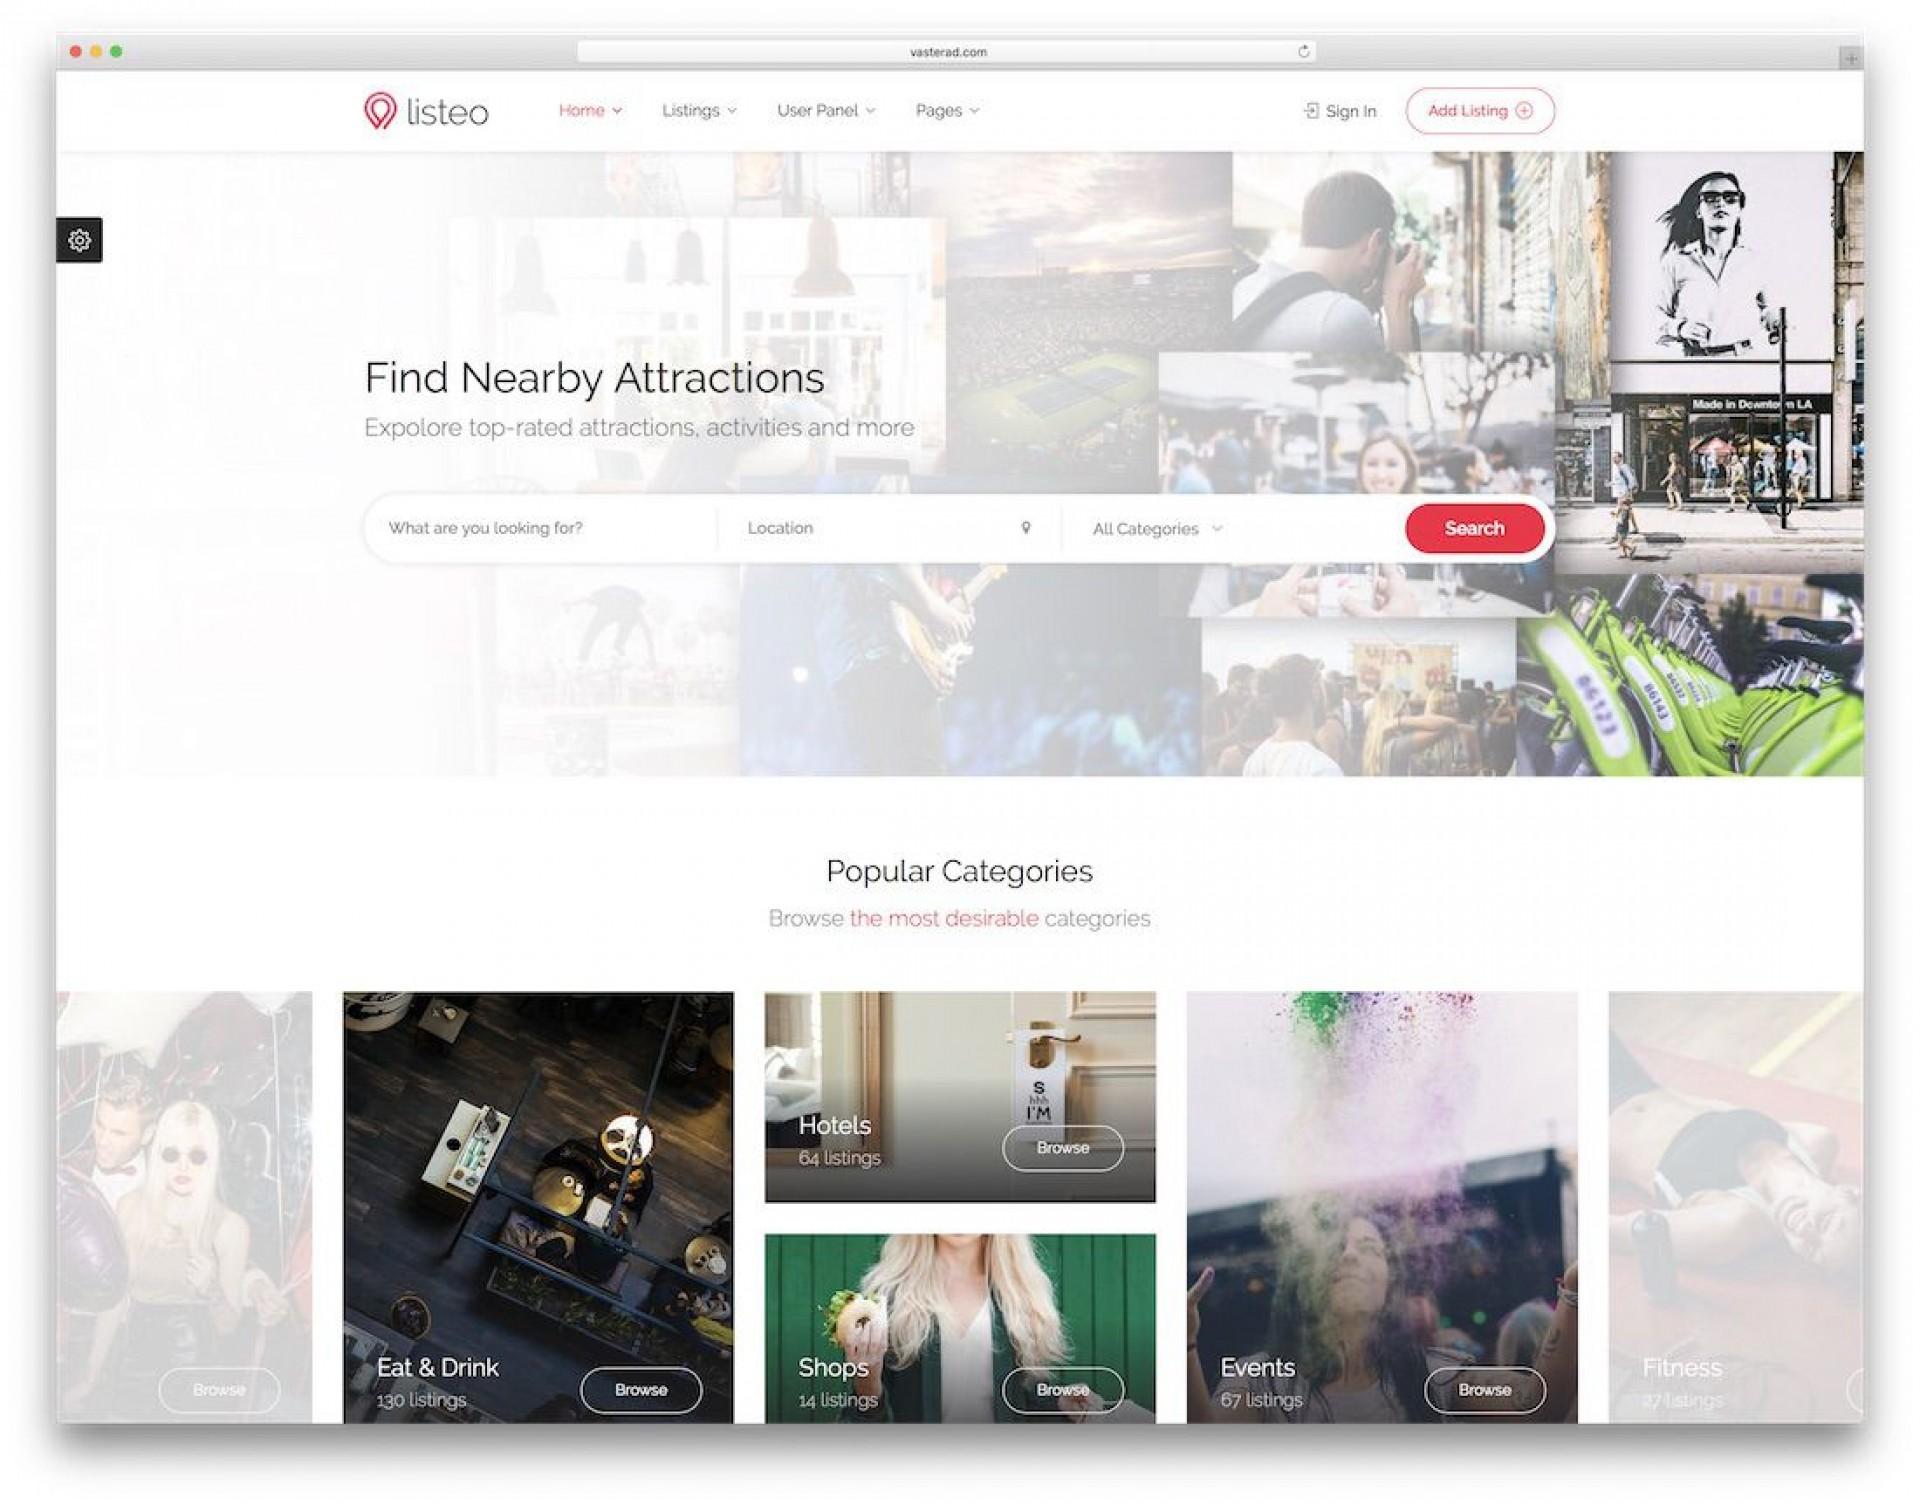 005 Impressive Mobile Friendly Website Template Concept  Best1920